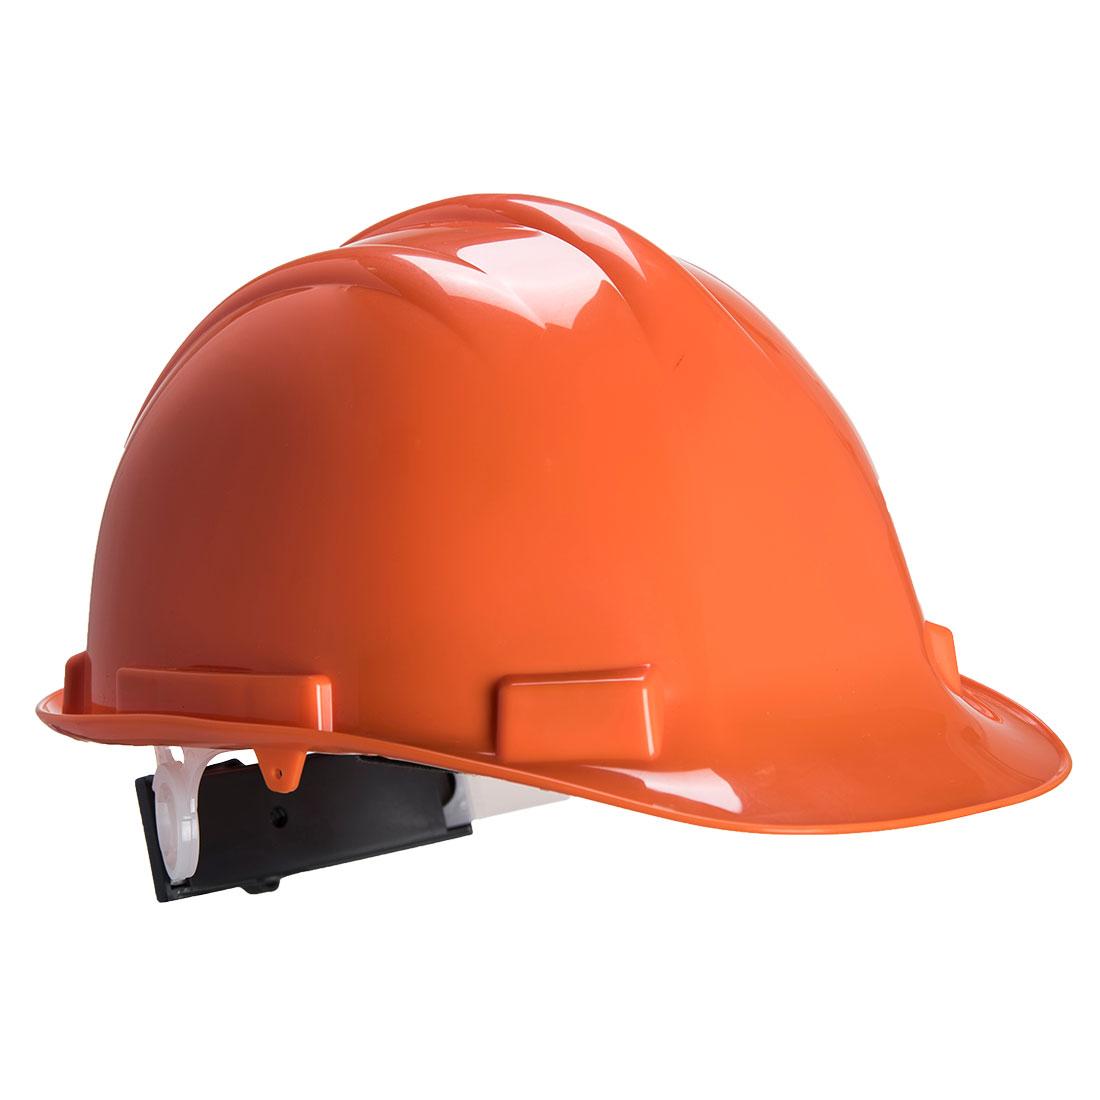 Expertbase Safety Helmet  PW50ORR